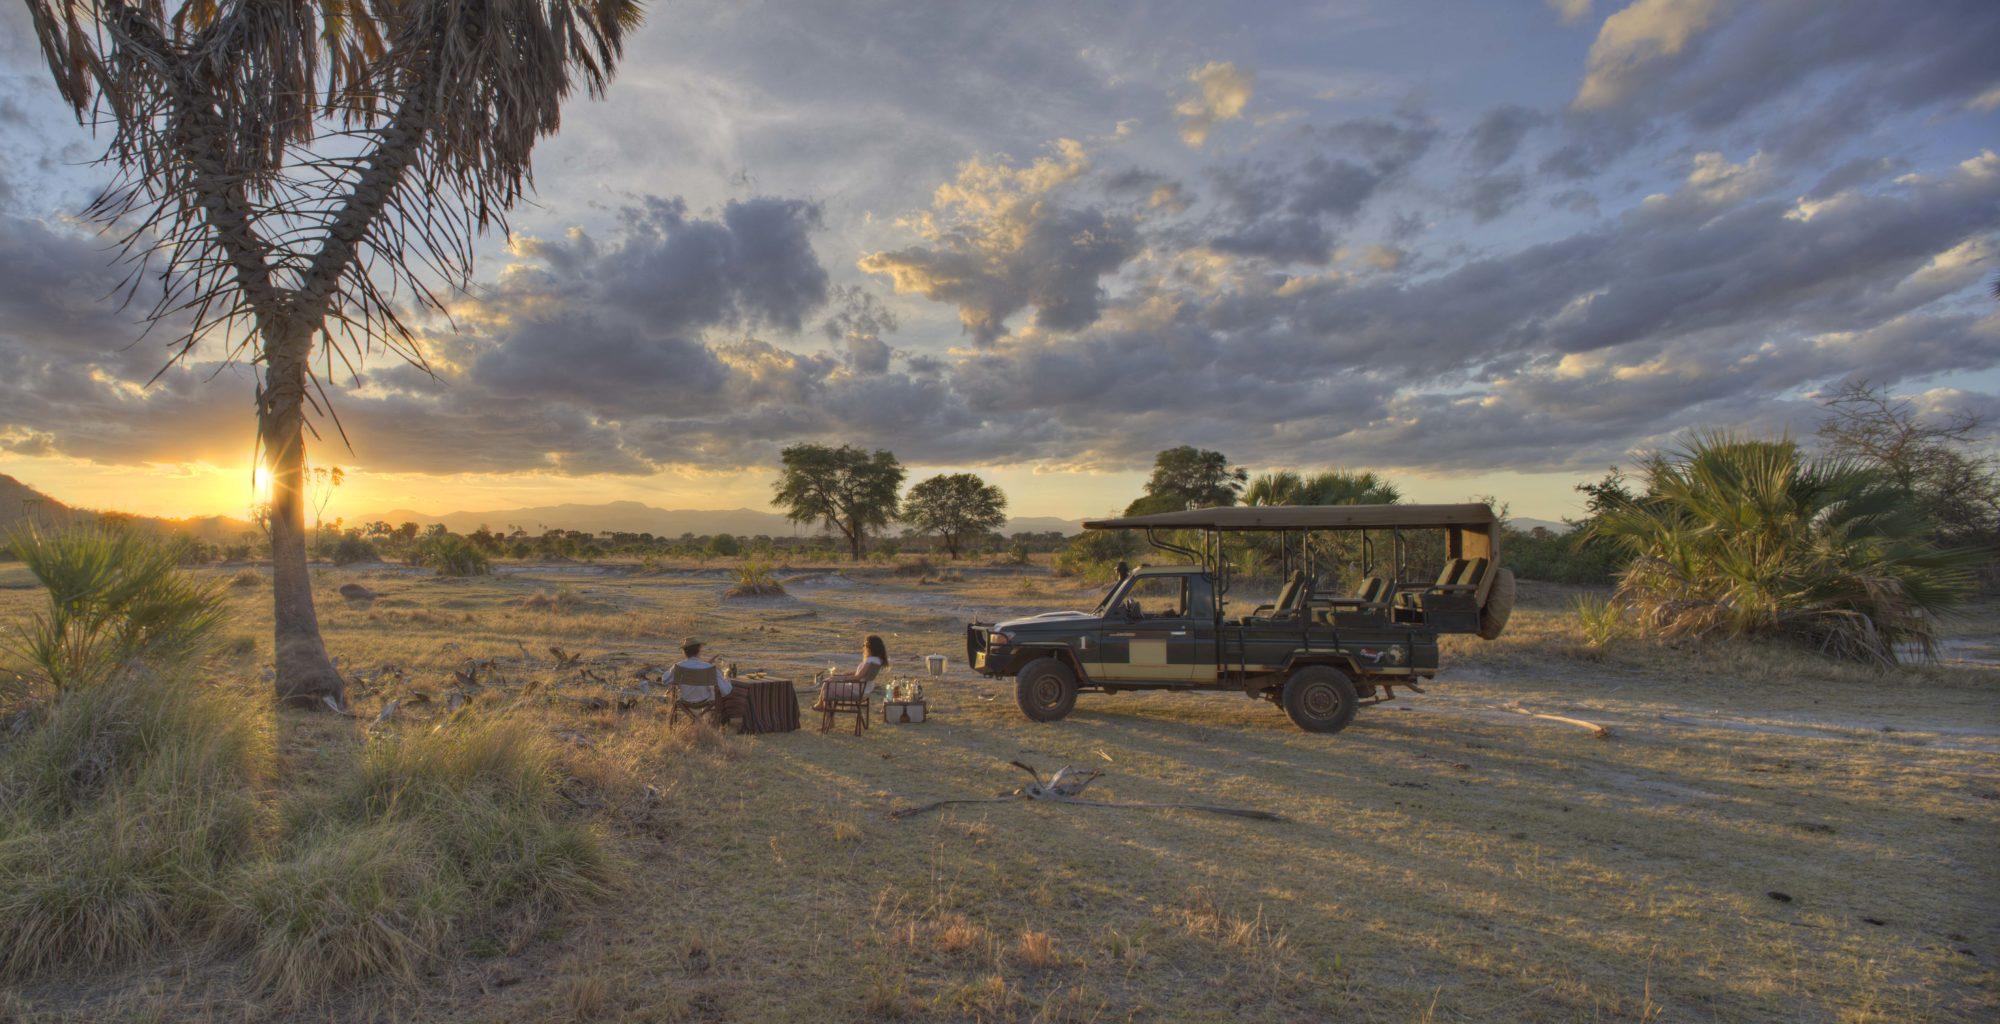 Kenya-Meru-National-Park-Sundowner